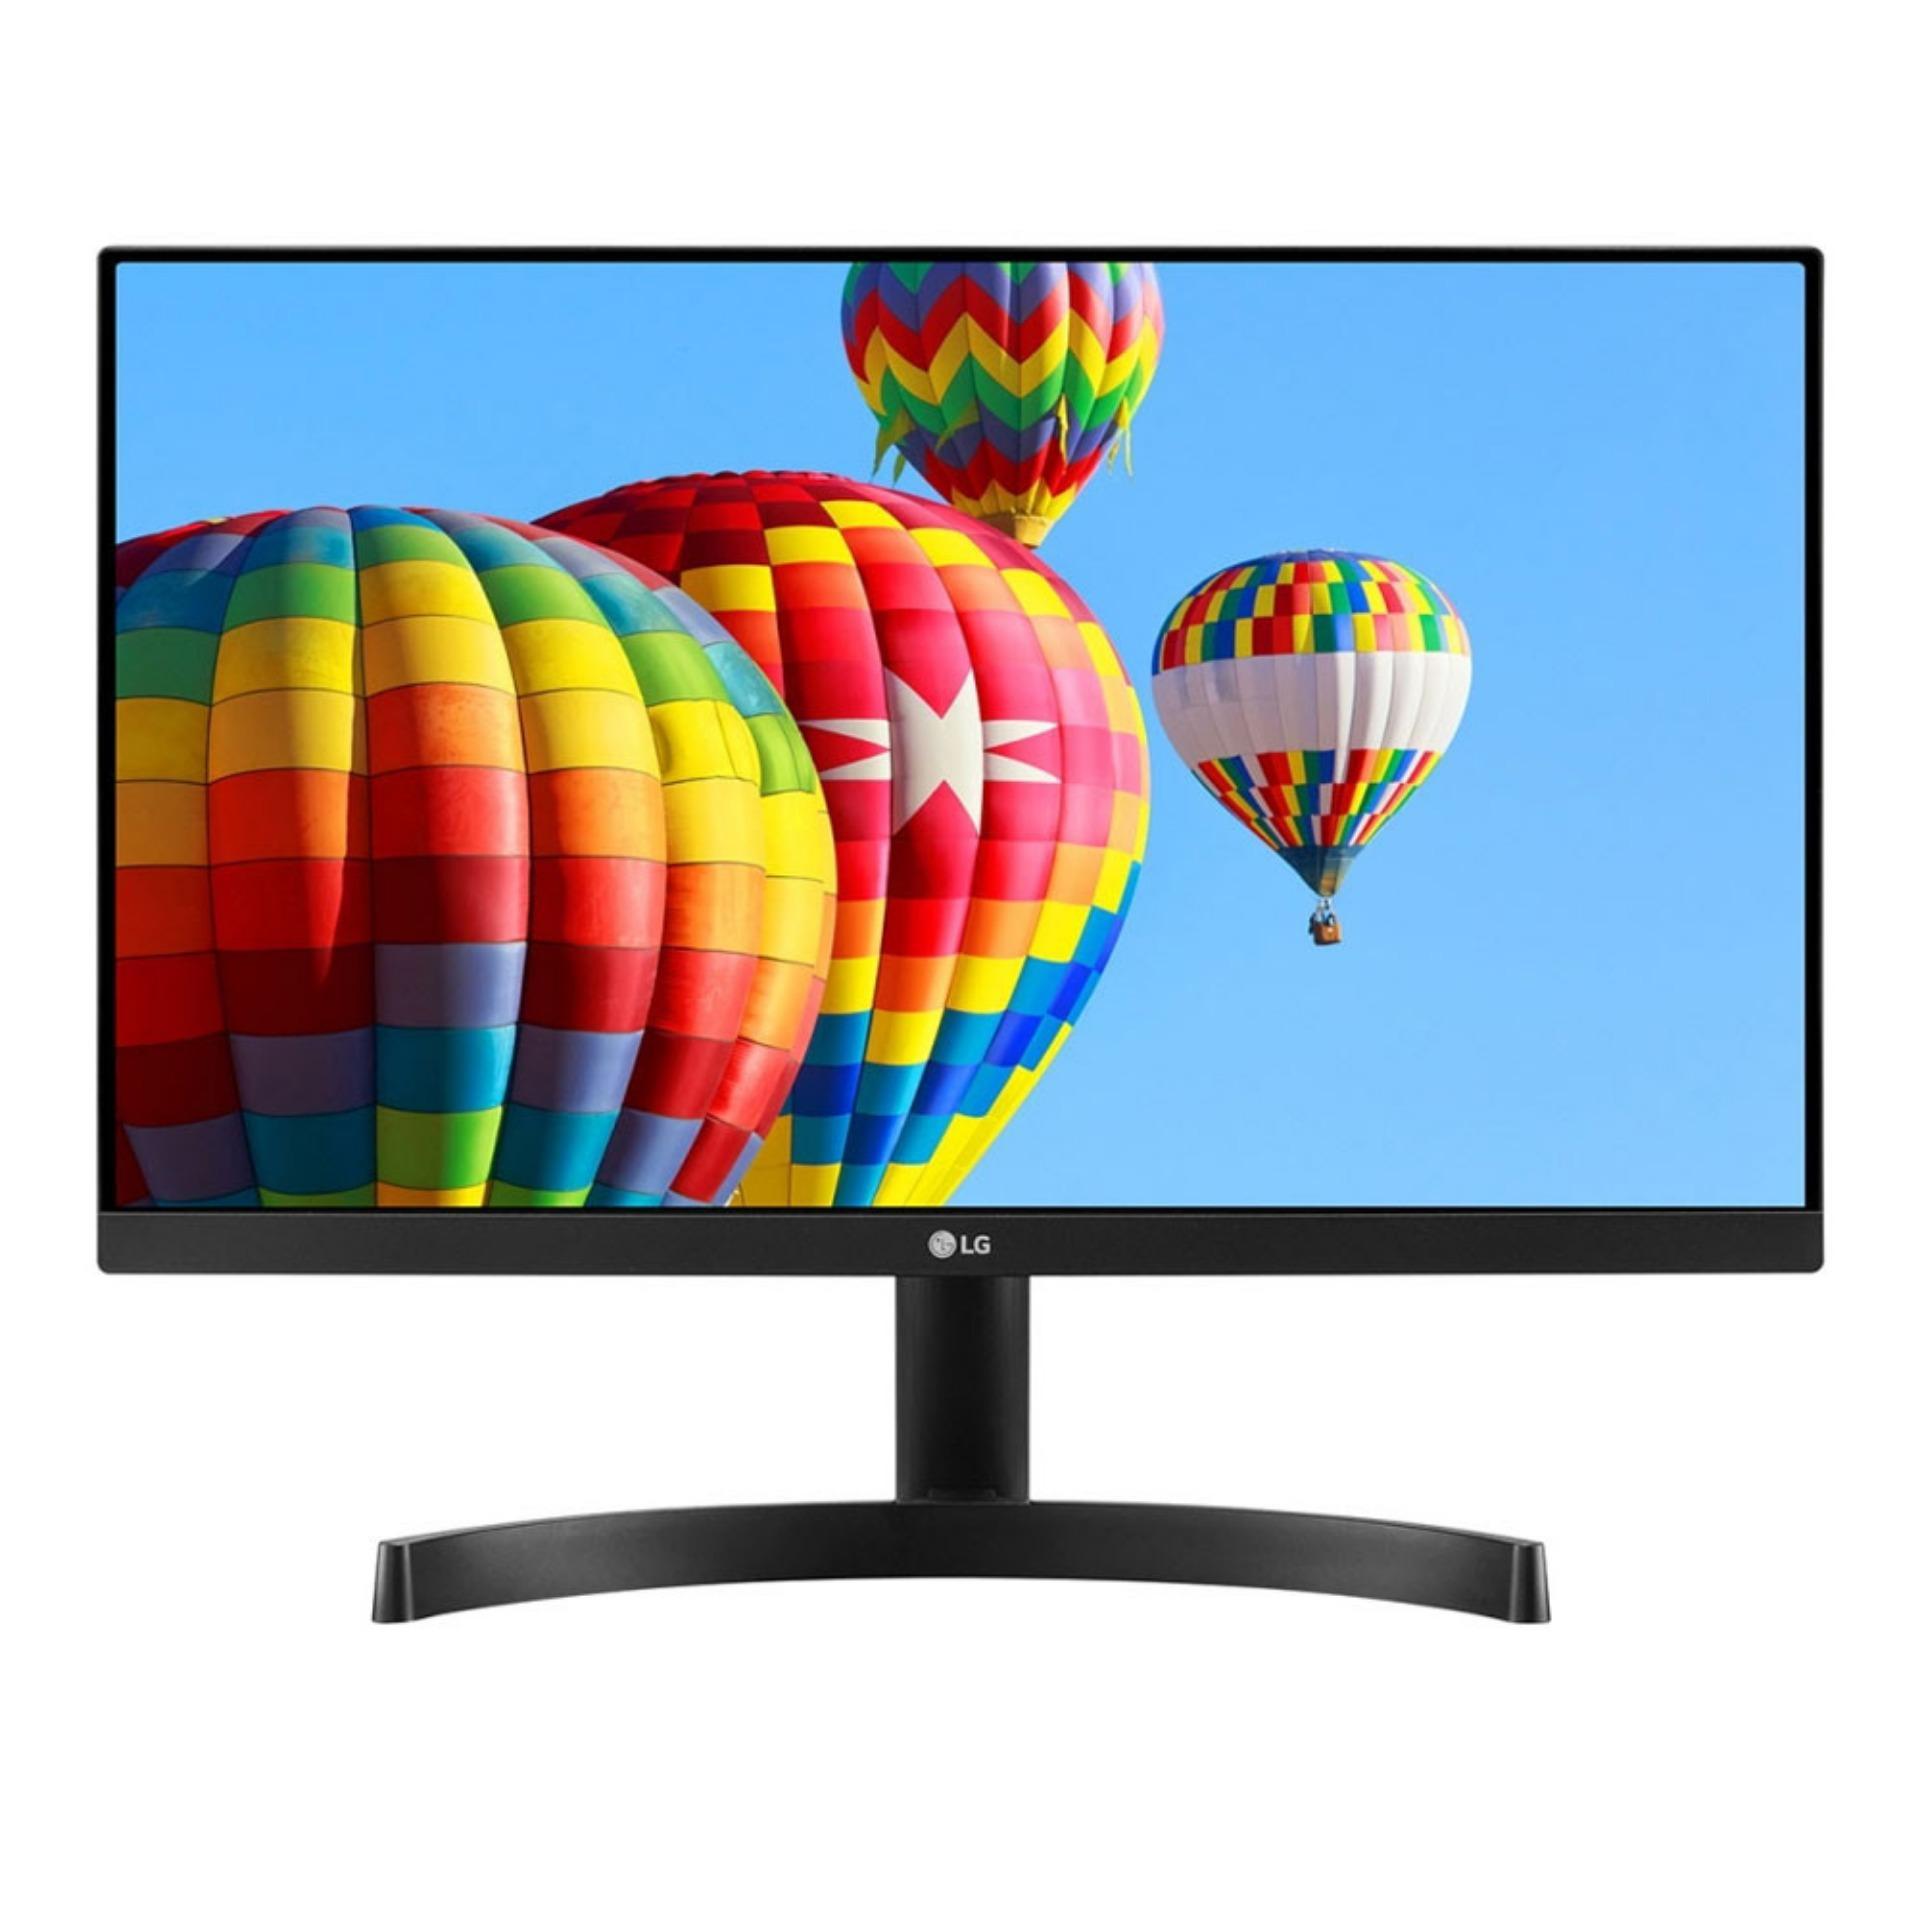 Monitor LG 2727MK600M-B LED IPS